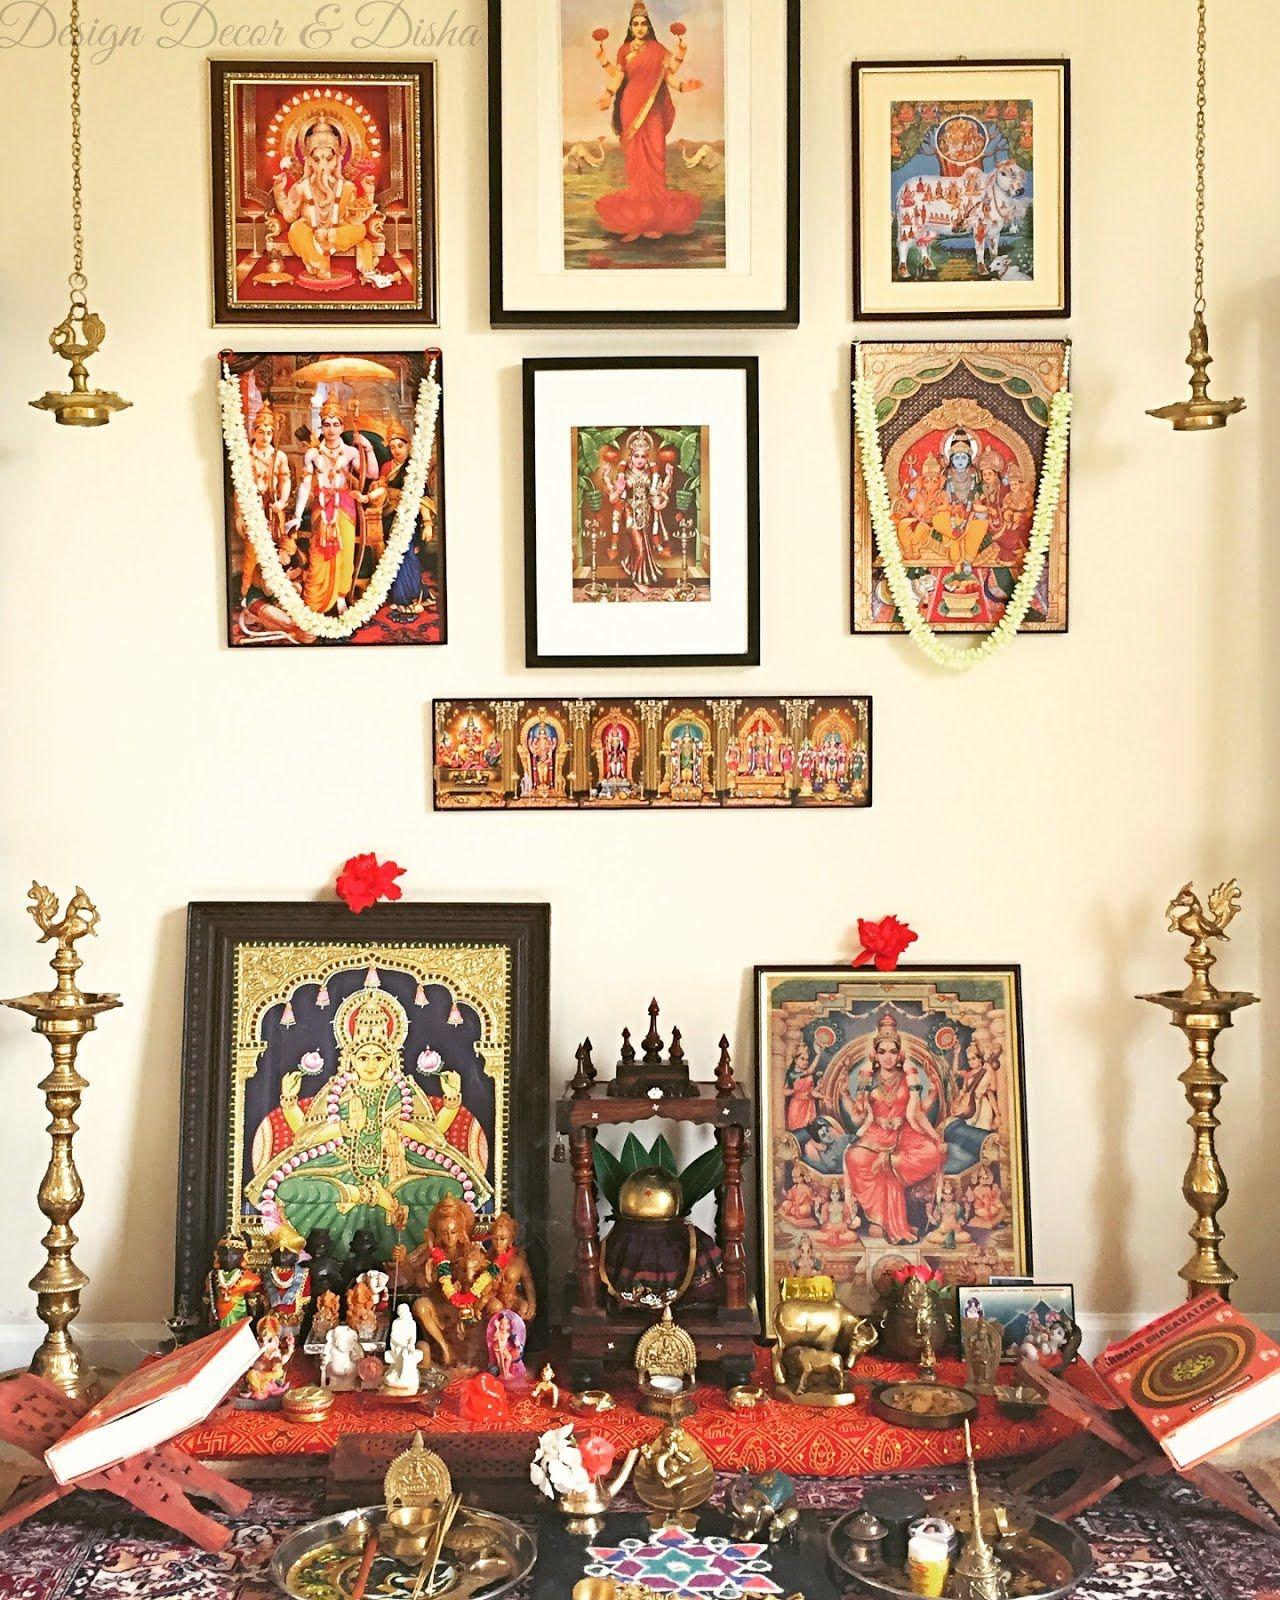 Traditional Indian Wall Decor Jpg 1280 1600 Indian Wall Decor